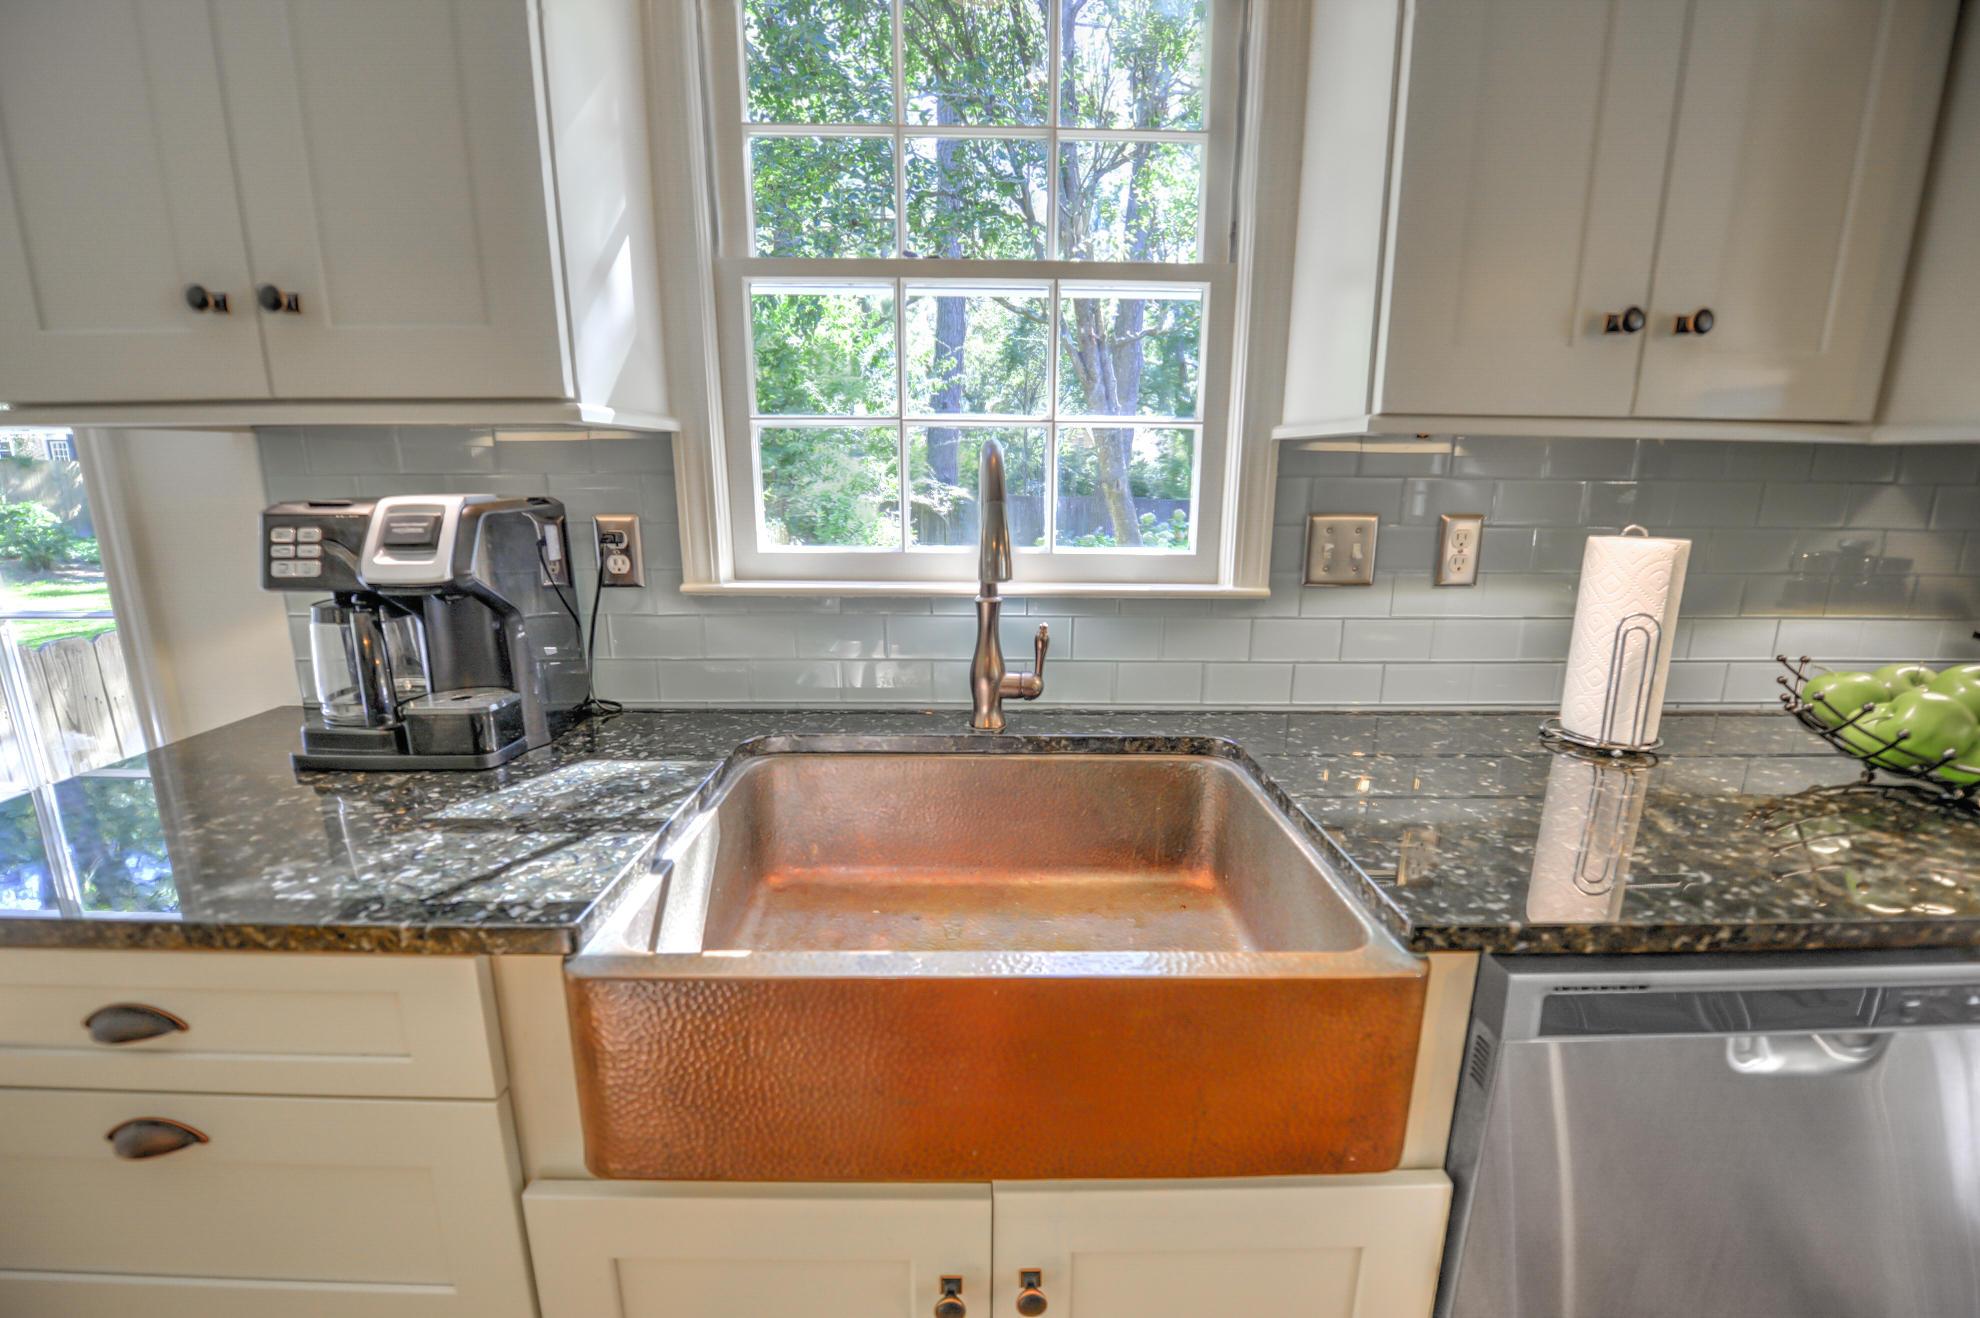 Shemwood II Homes For Sale - 1017 Jack Snipe, Mount Pleasant, SC - 32